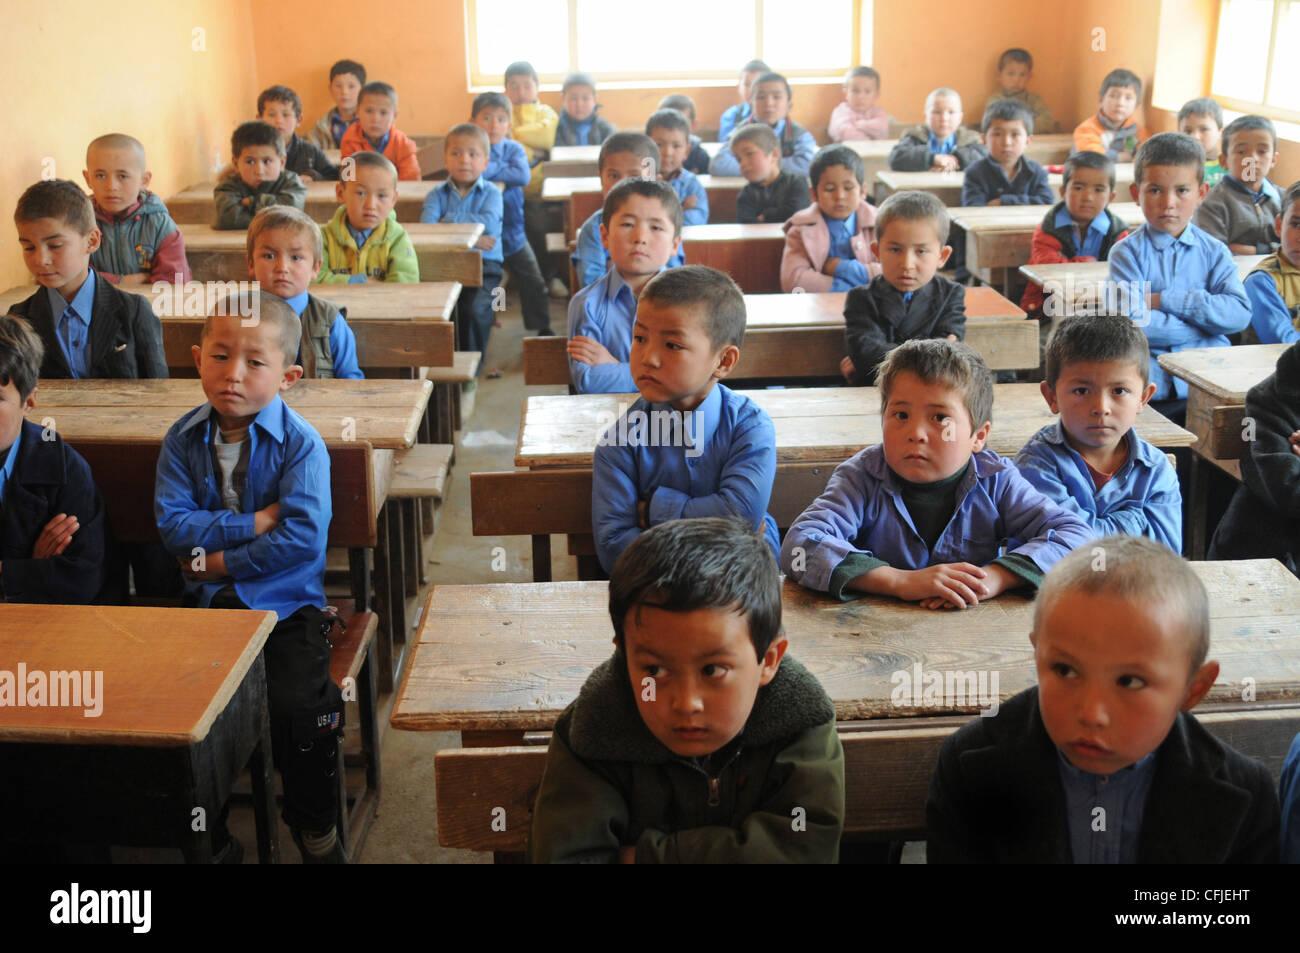 Young Afghan boys sit in their Aliabad School classroom near Mazar-e-Sharif, Afghanistan, March 10, 2012. Their - Stock Image